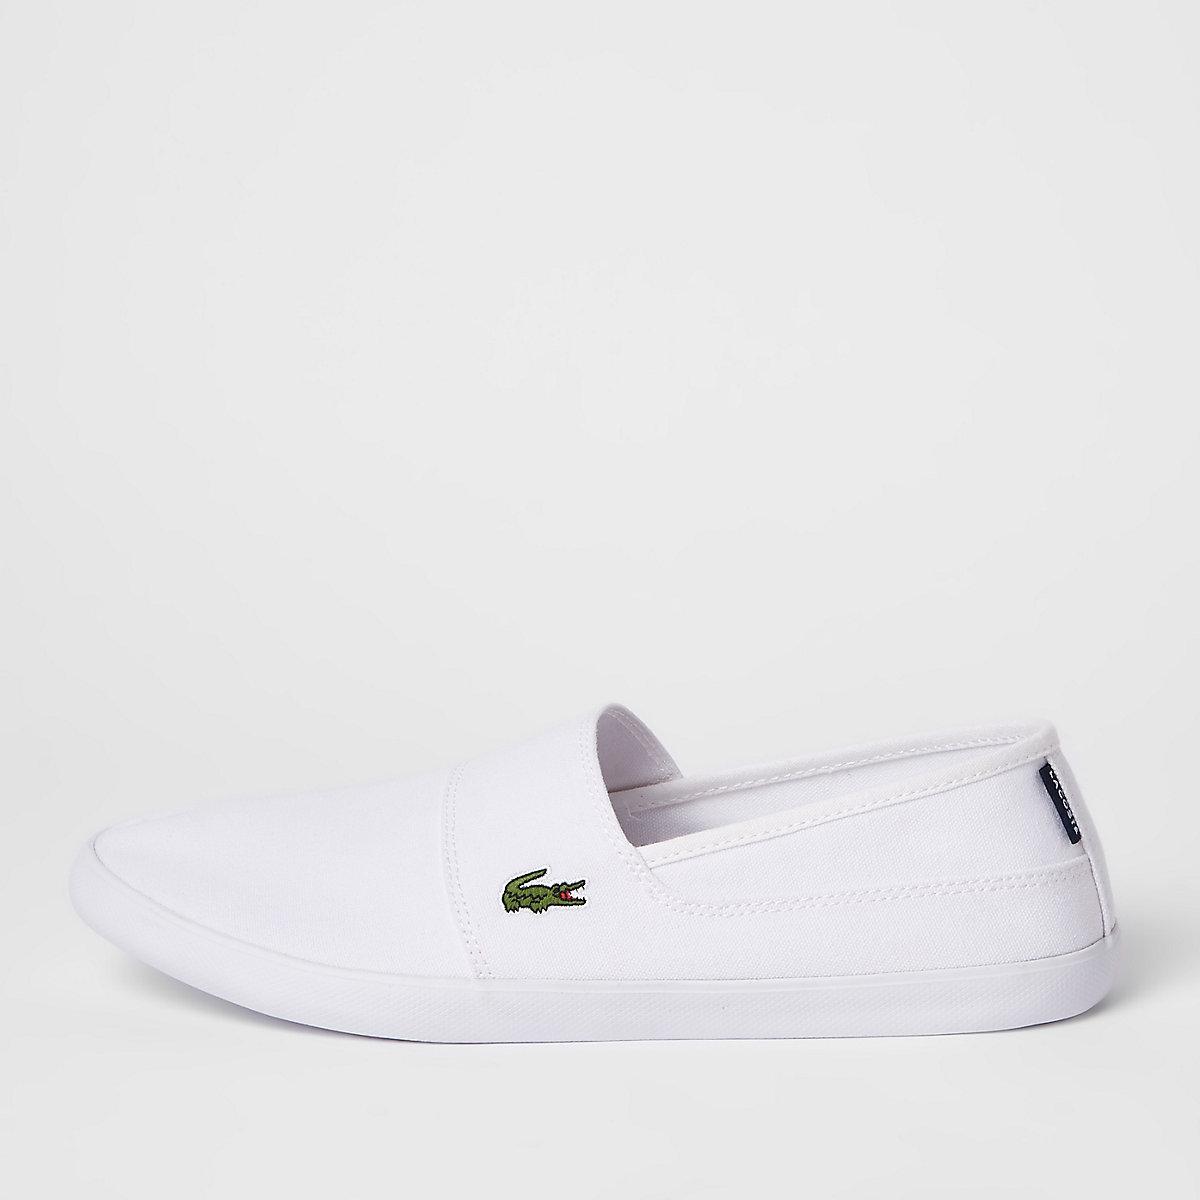 Lacoste white slip on sneakers